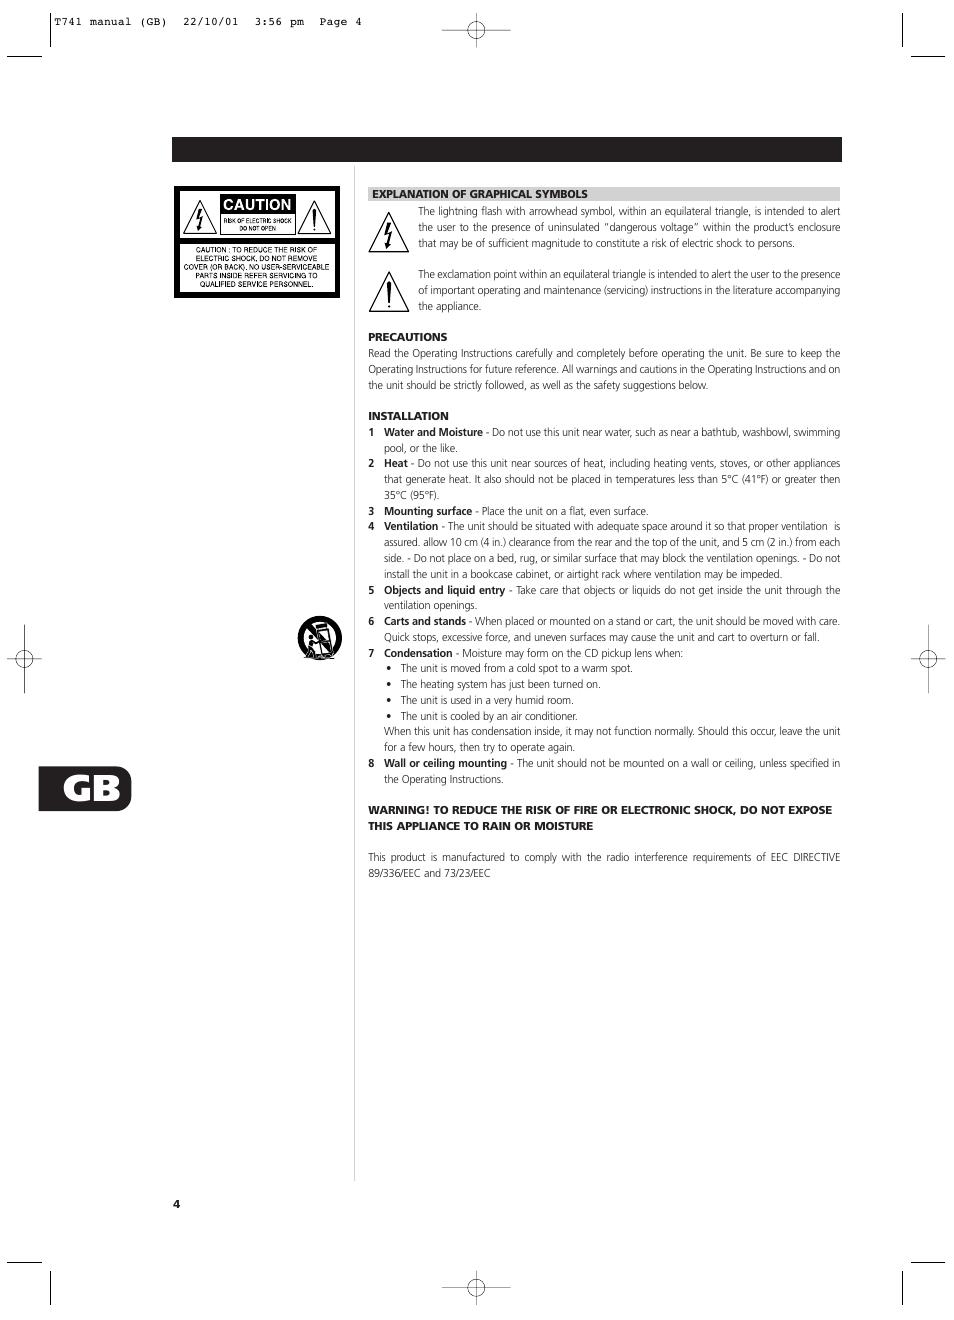 nad t741 user manual page 4 20 rh manualsdir com